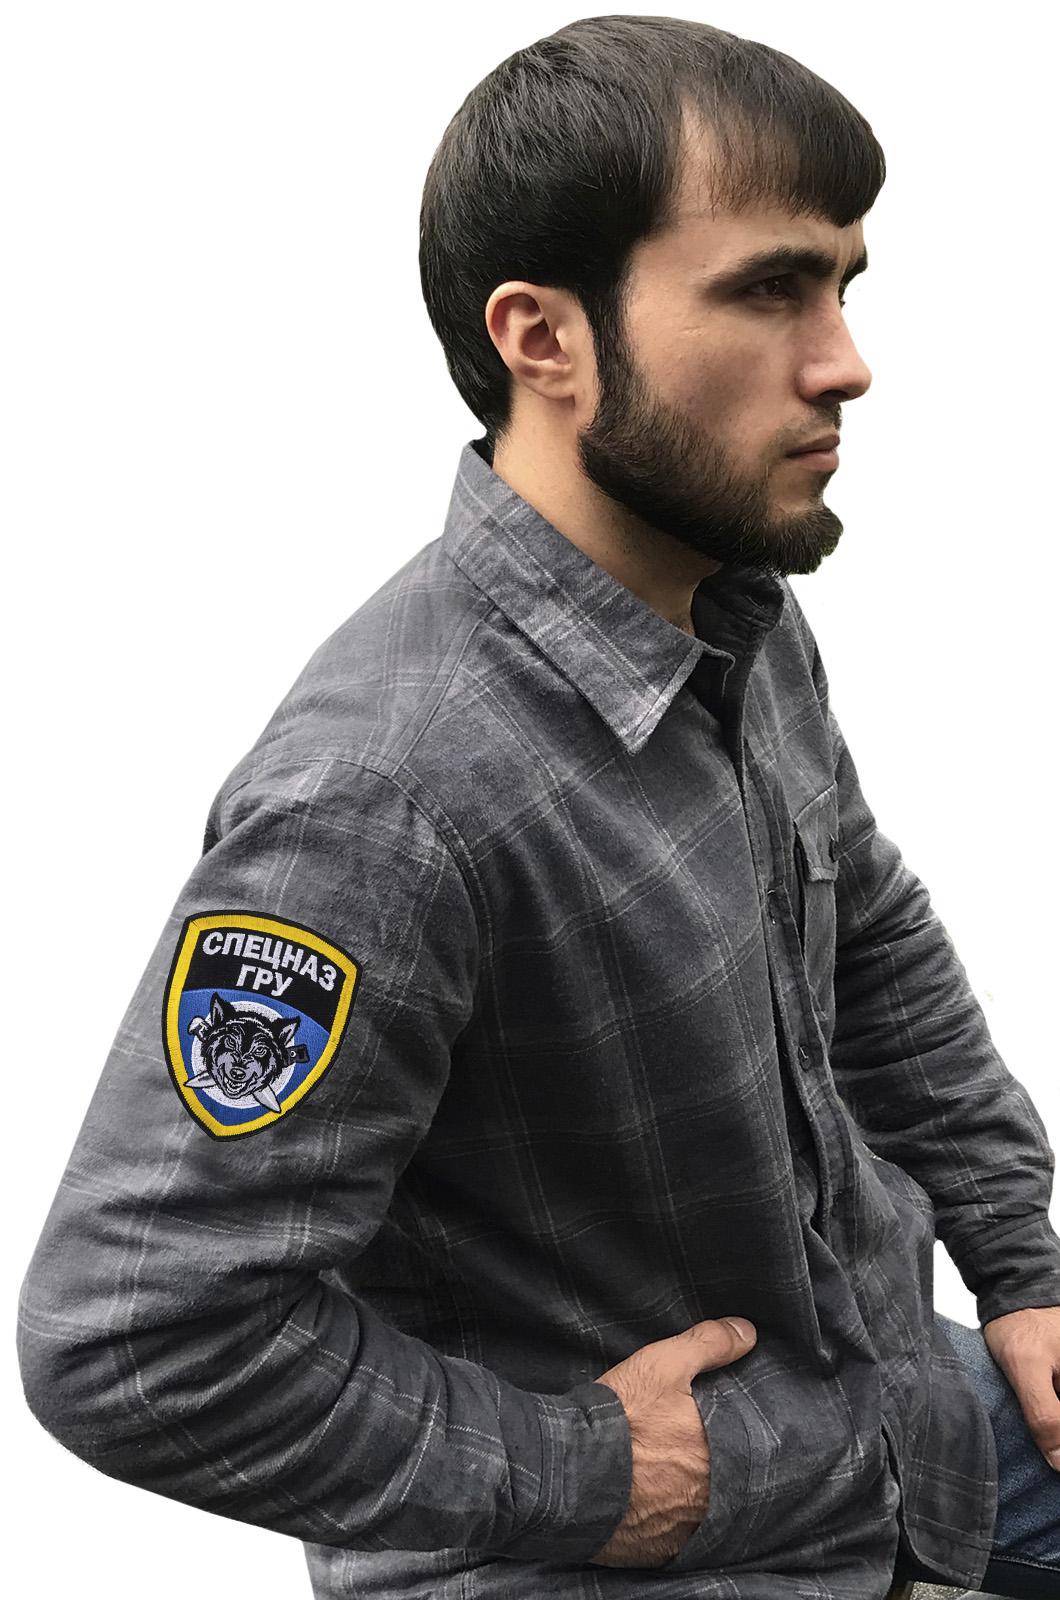 Теплая мужская рубашка Спецназа ГРУ